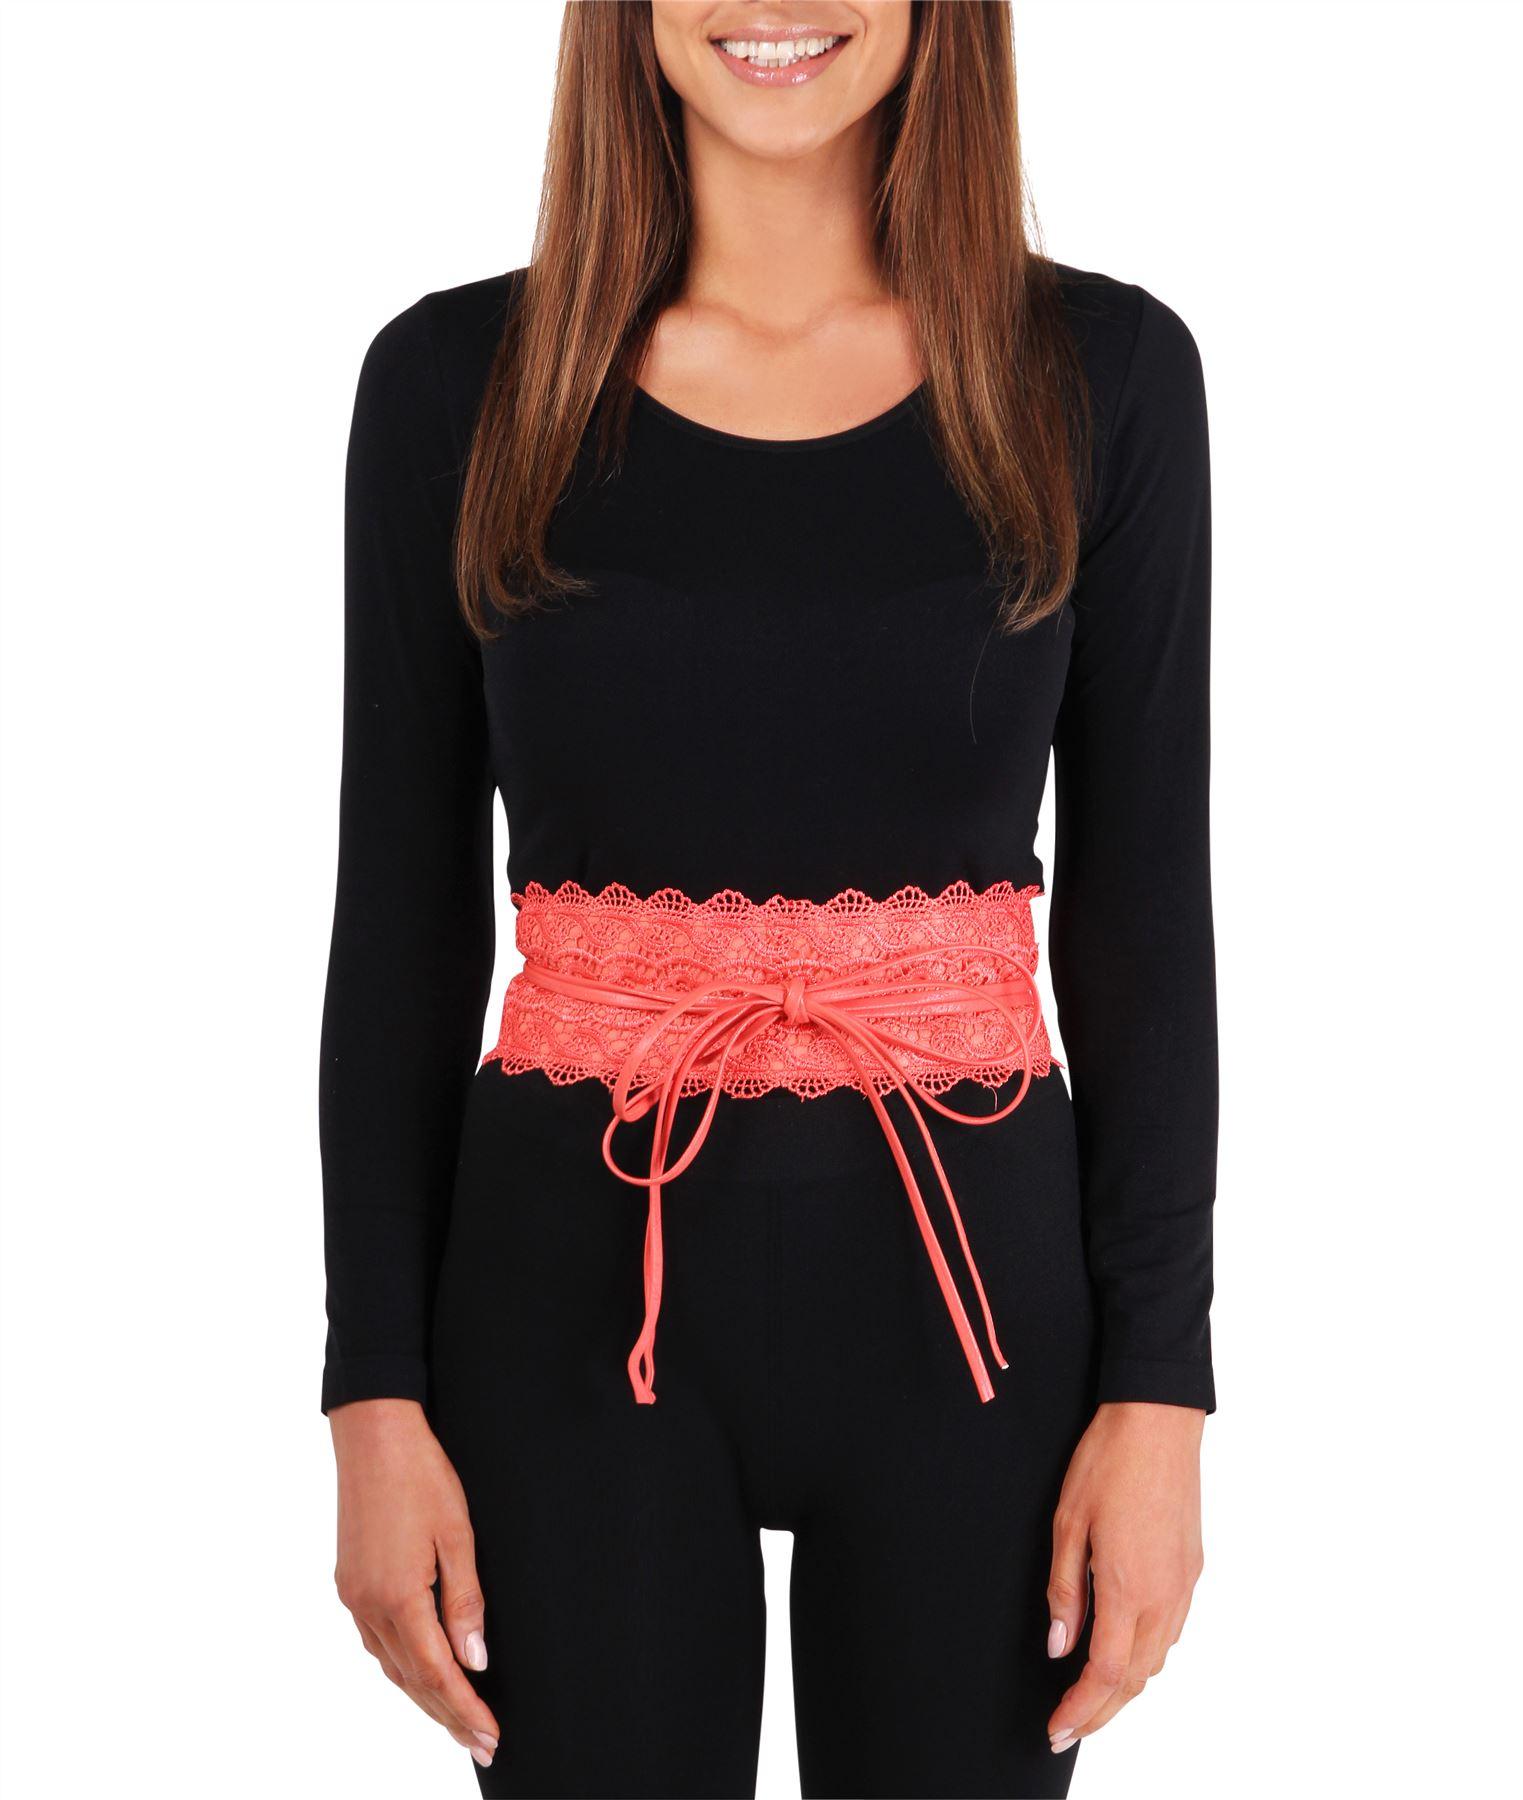 thumbnail 17 - Womens-Ladies-Wide-Waist-Belt-Floral-Waistband-Pattern-Band-Crochet-Lace-Corset